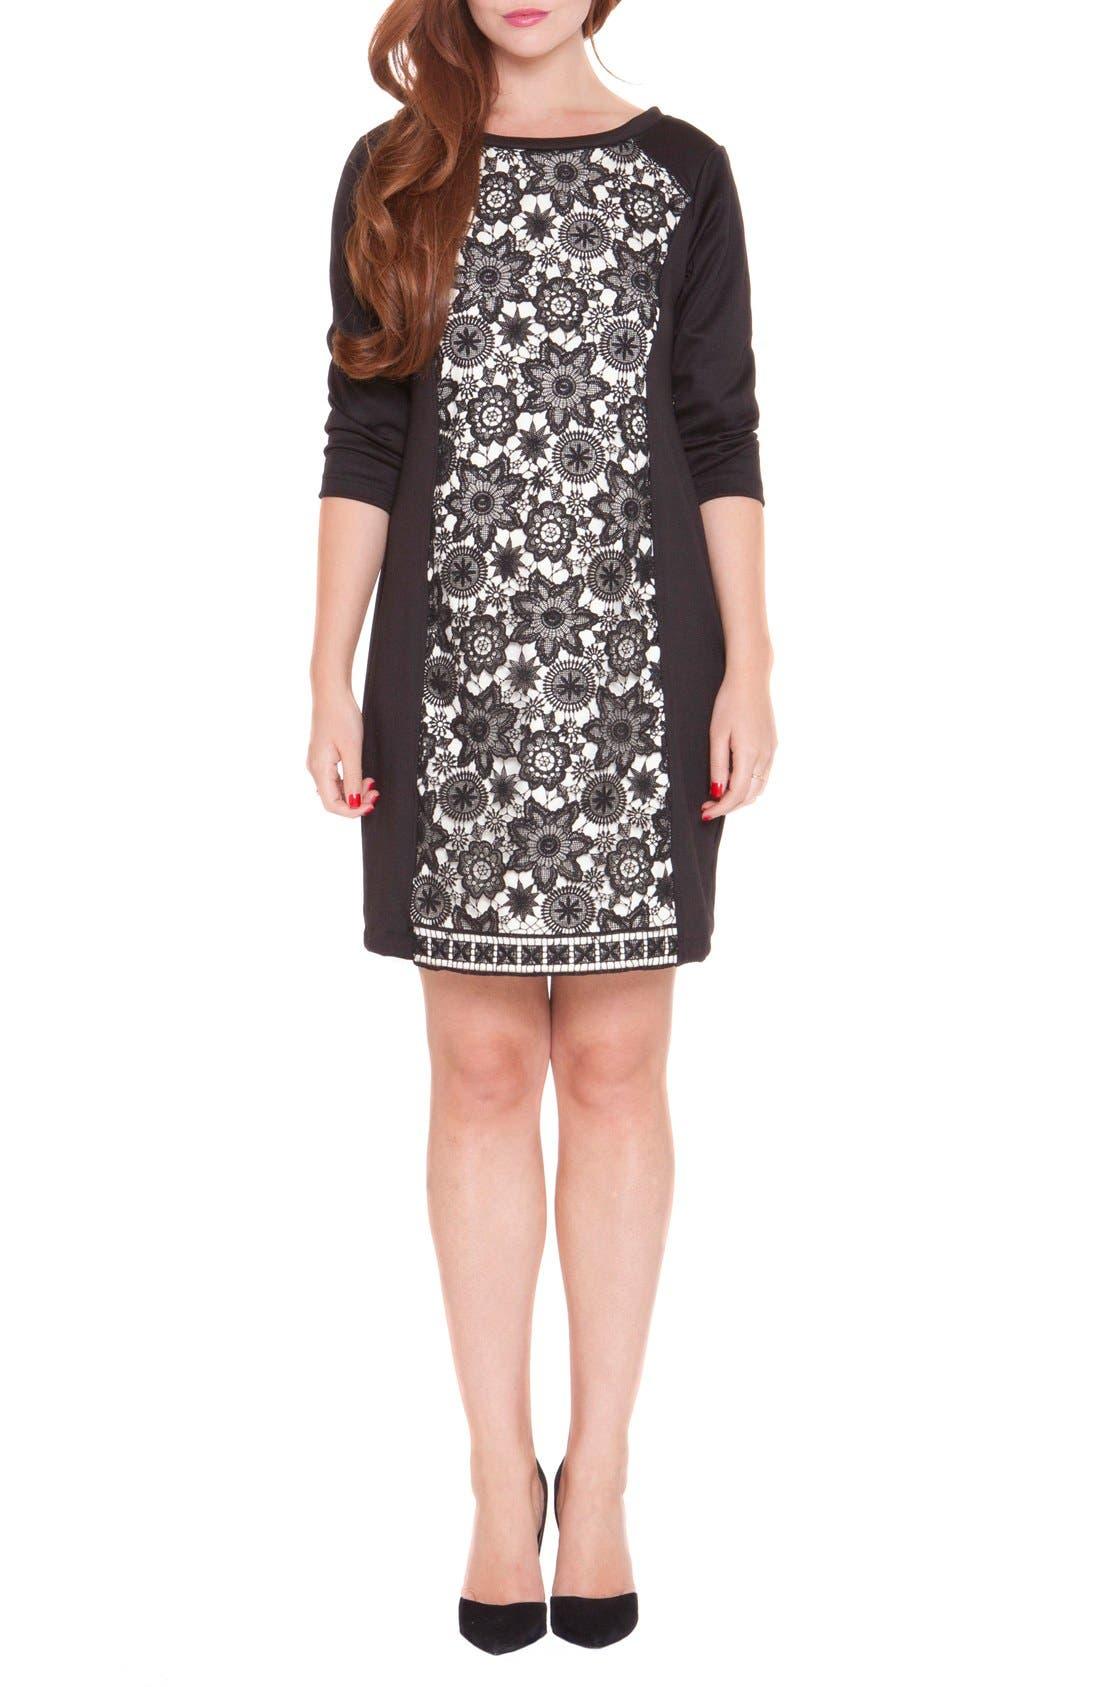 OLIAN 'Eloise' Maternity Shift Dress